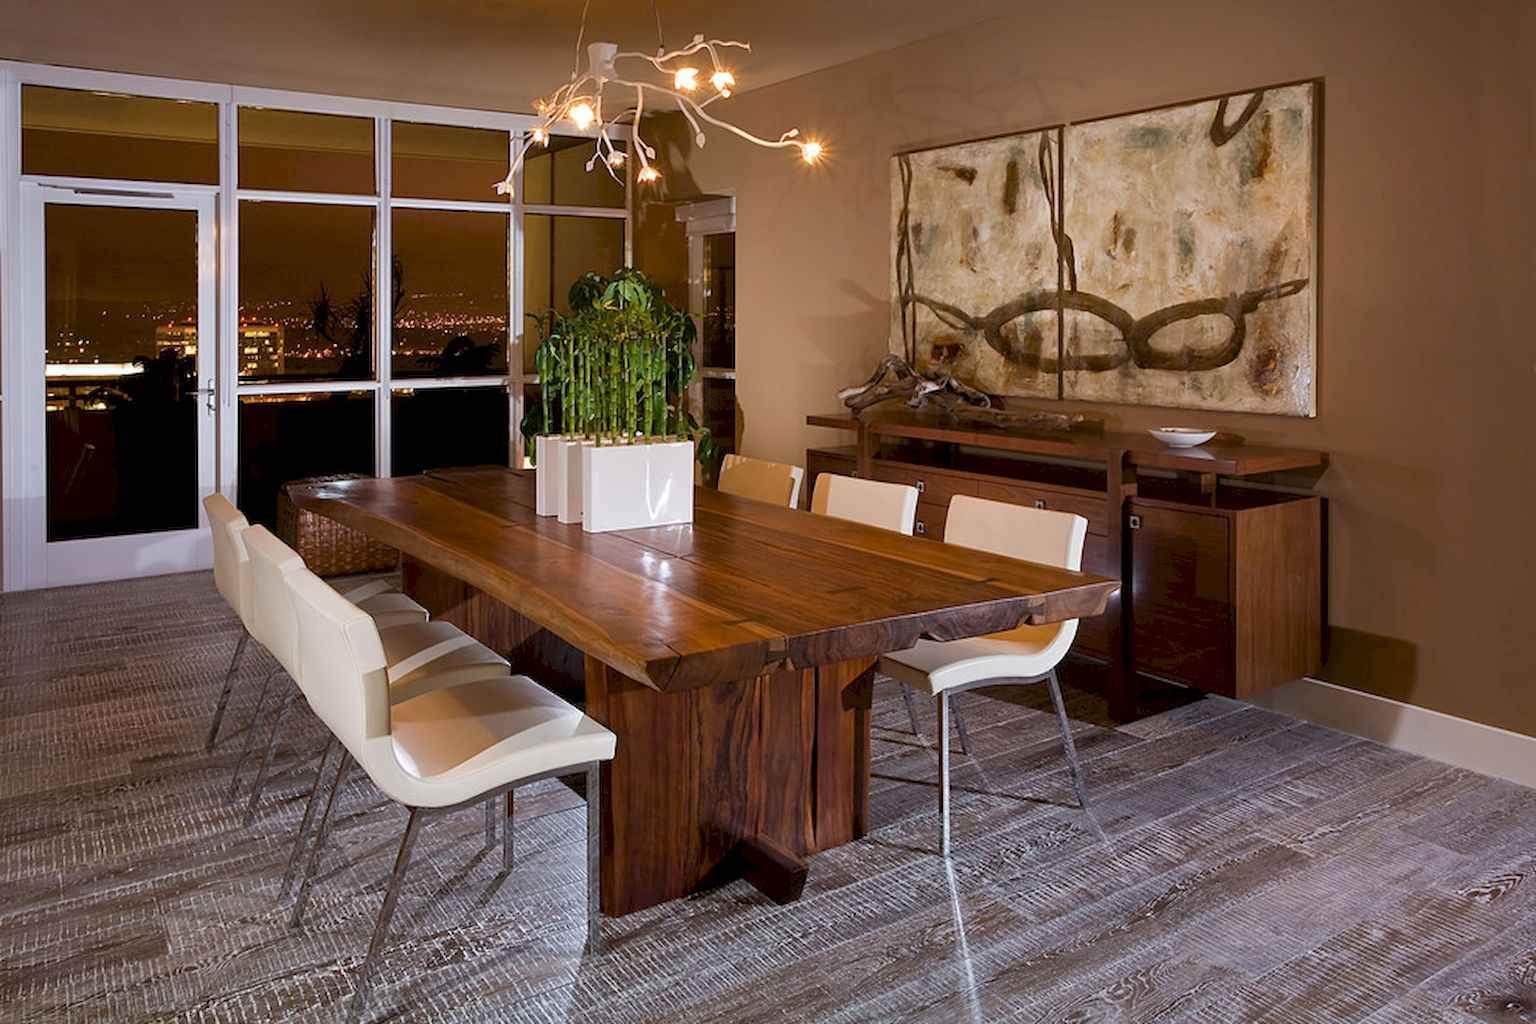 100 Rustic Farmhouse Dining Room Decor Ideas (92)